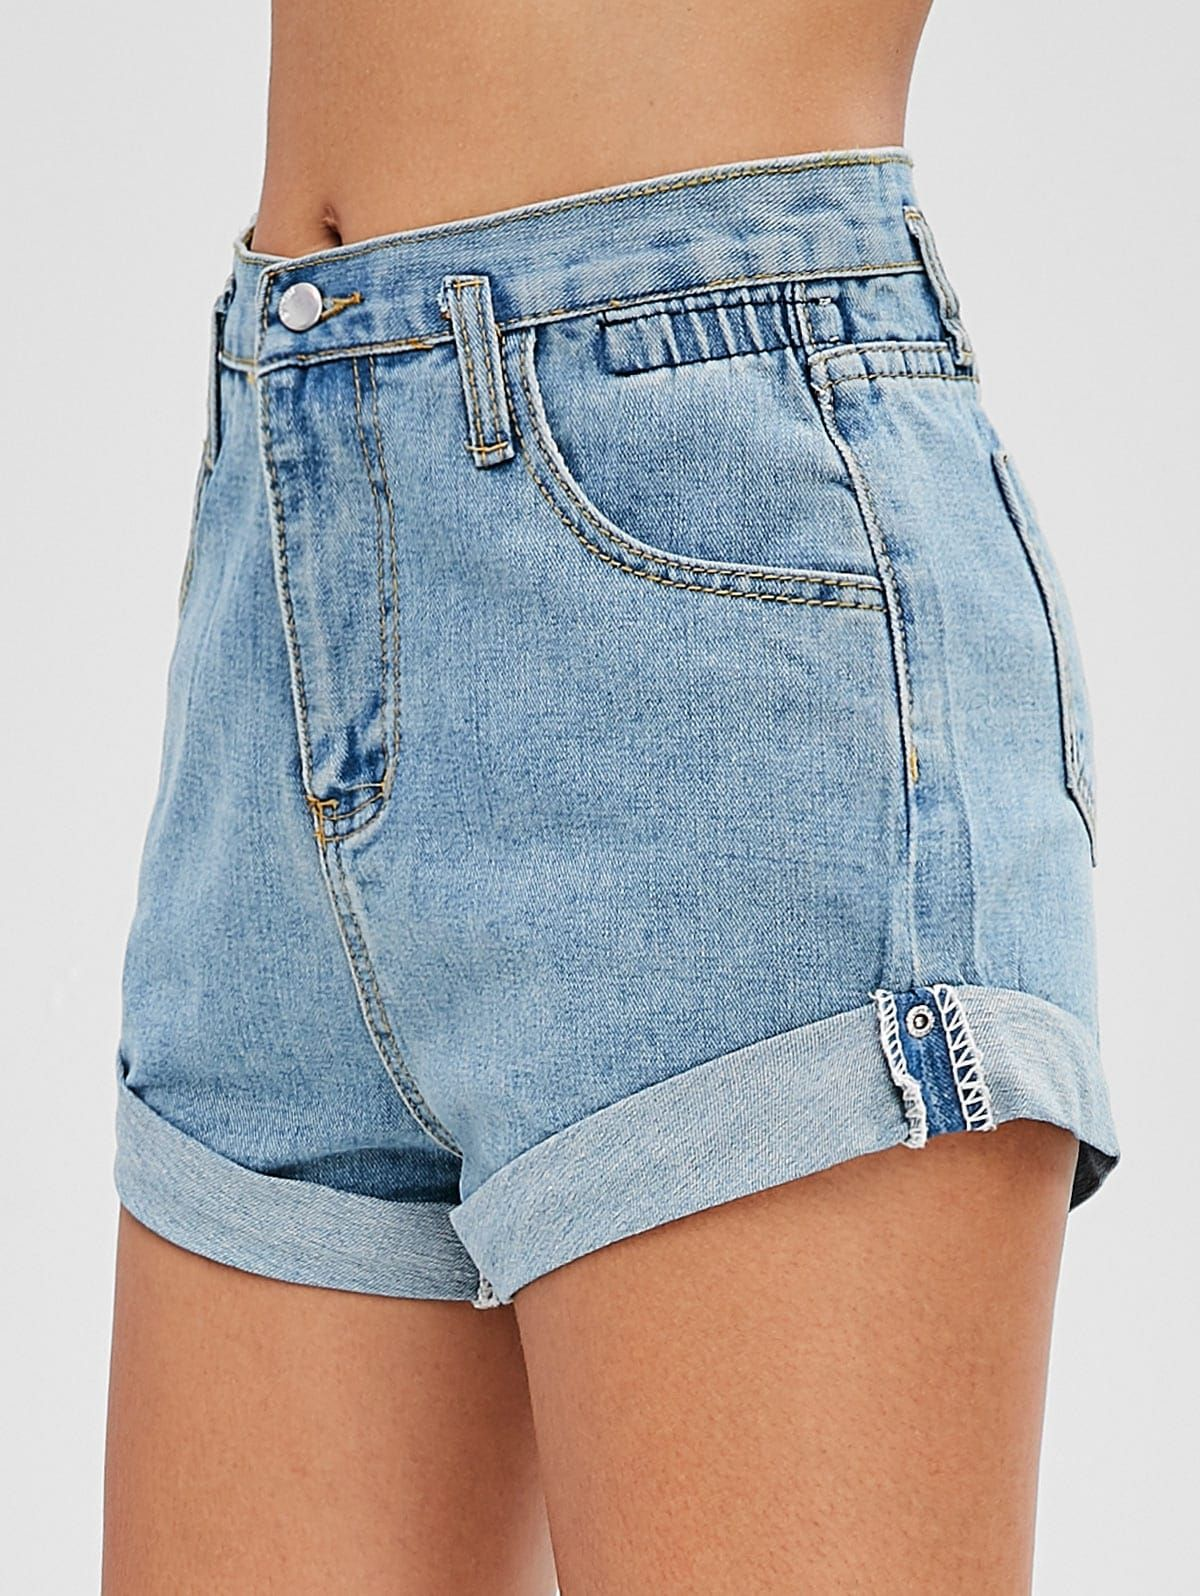 8b693faa956 High Waisted Denim Cuffed Shorts in 2019 | yo en verano | Denim shorts,  Denim, Black denim